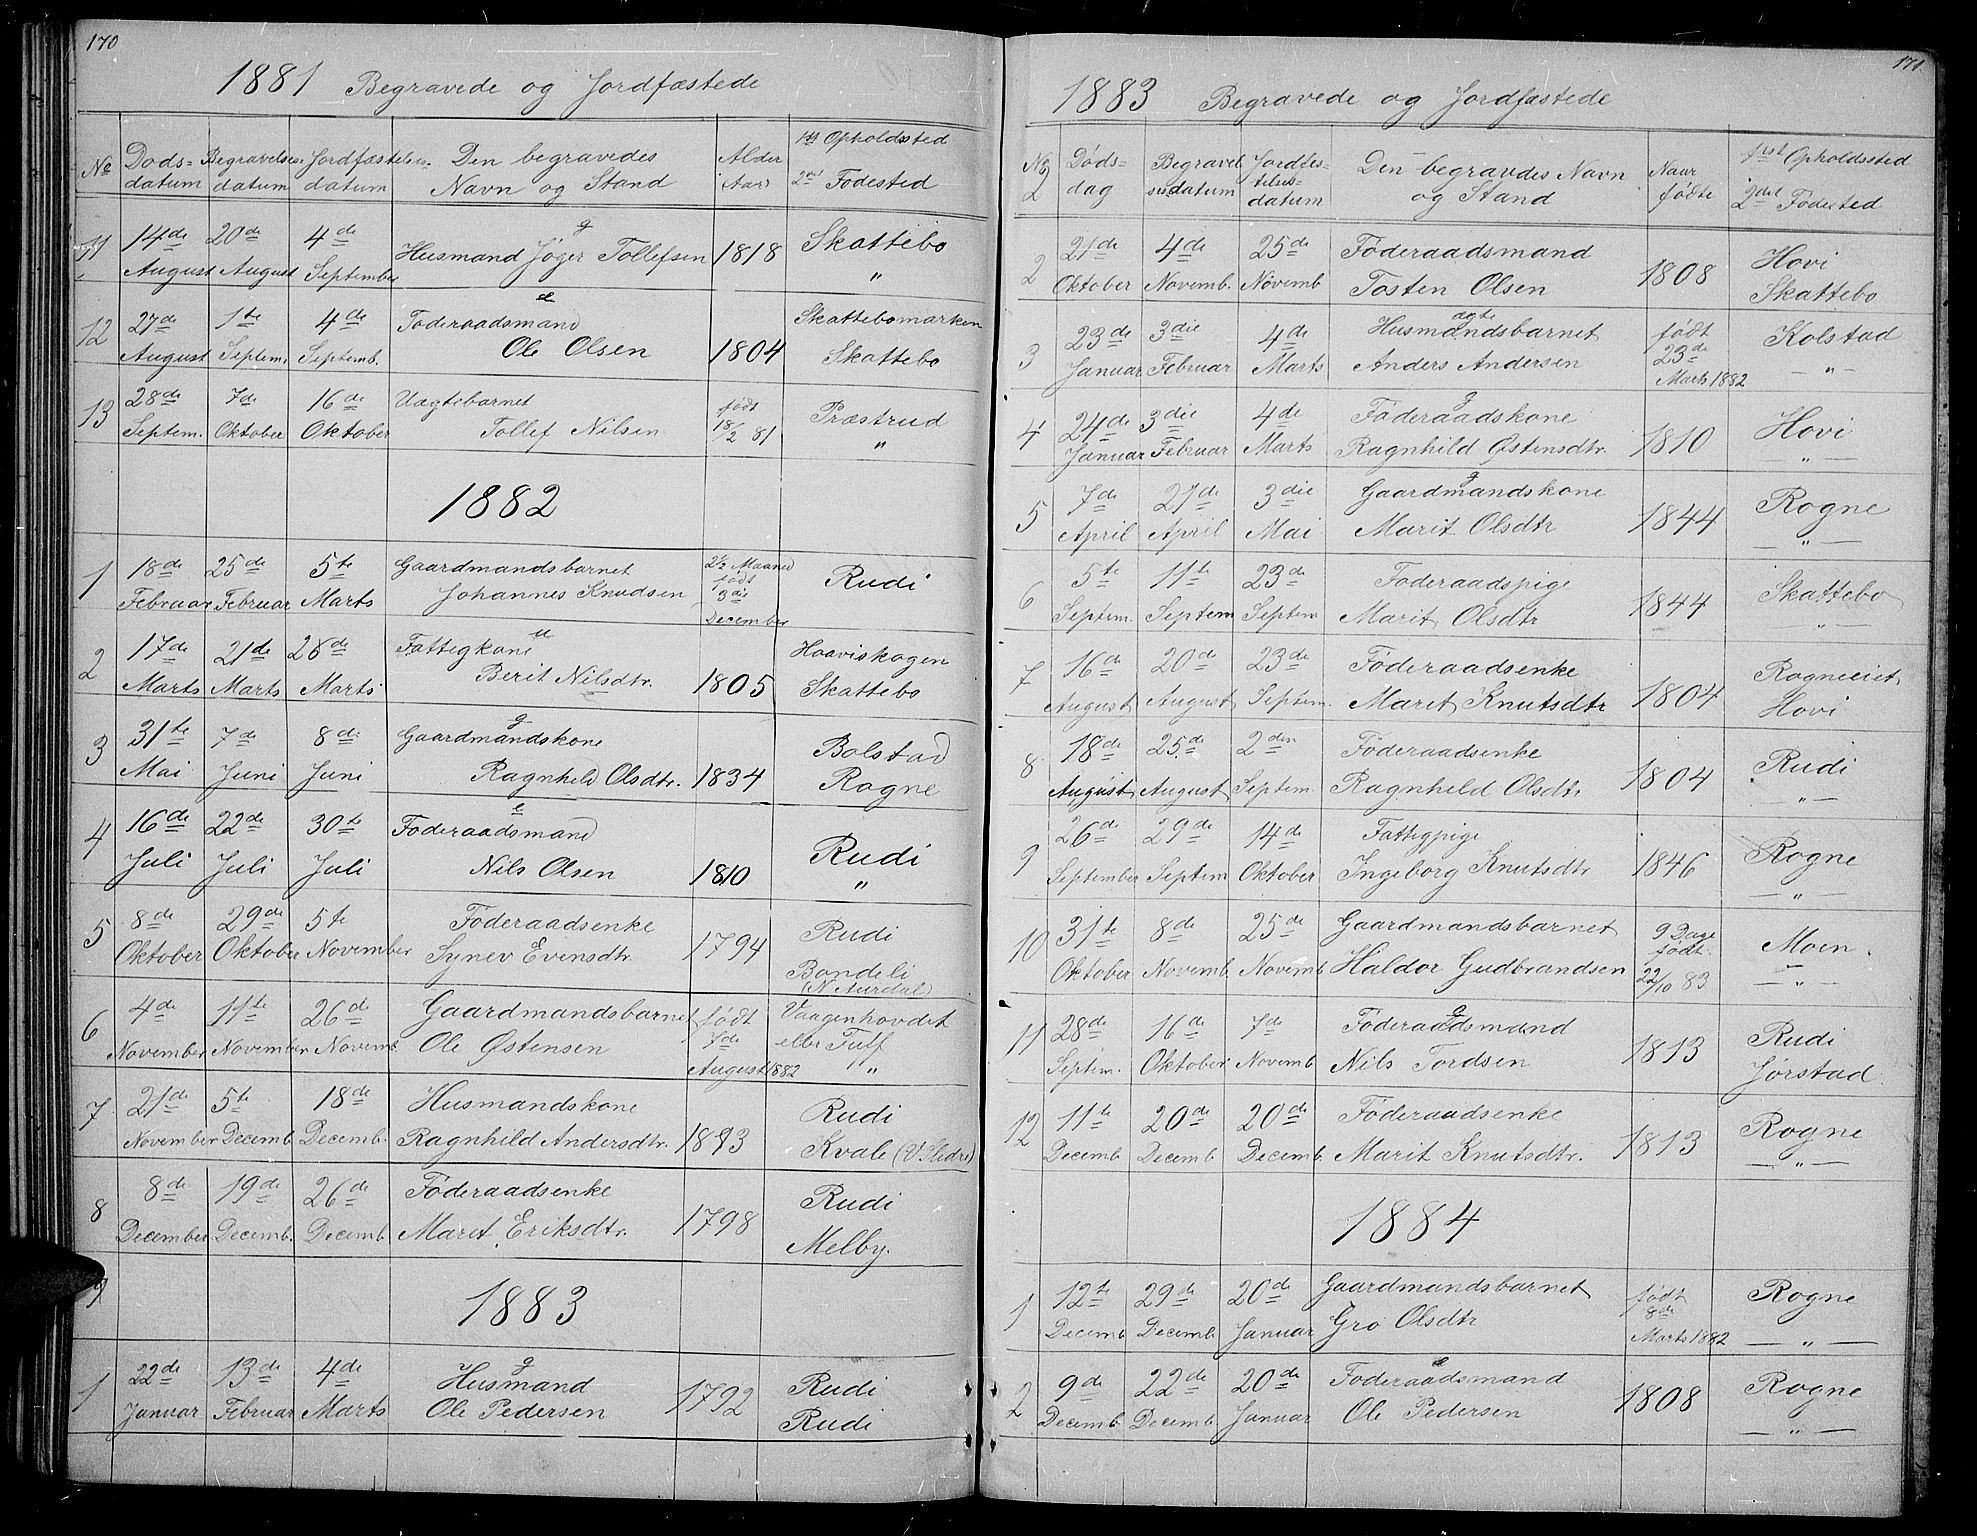 SAH, Øystre Slidre prestekontor, Klokkerbok nr. 3, 1866-1886, s. 170-171